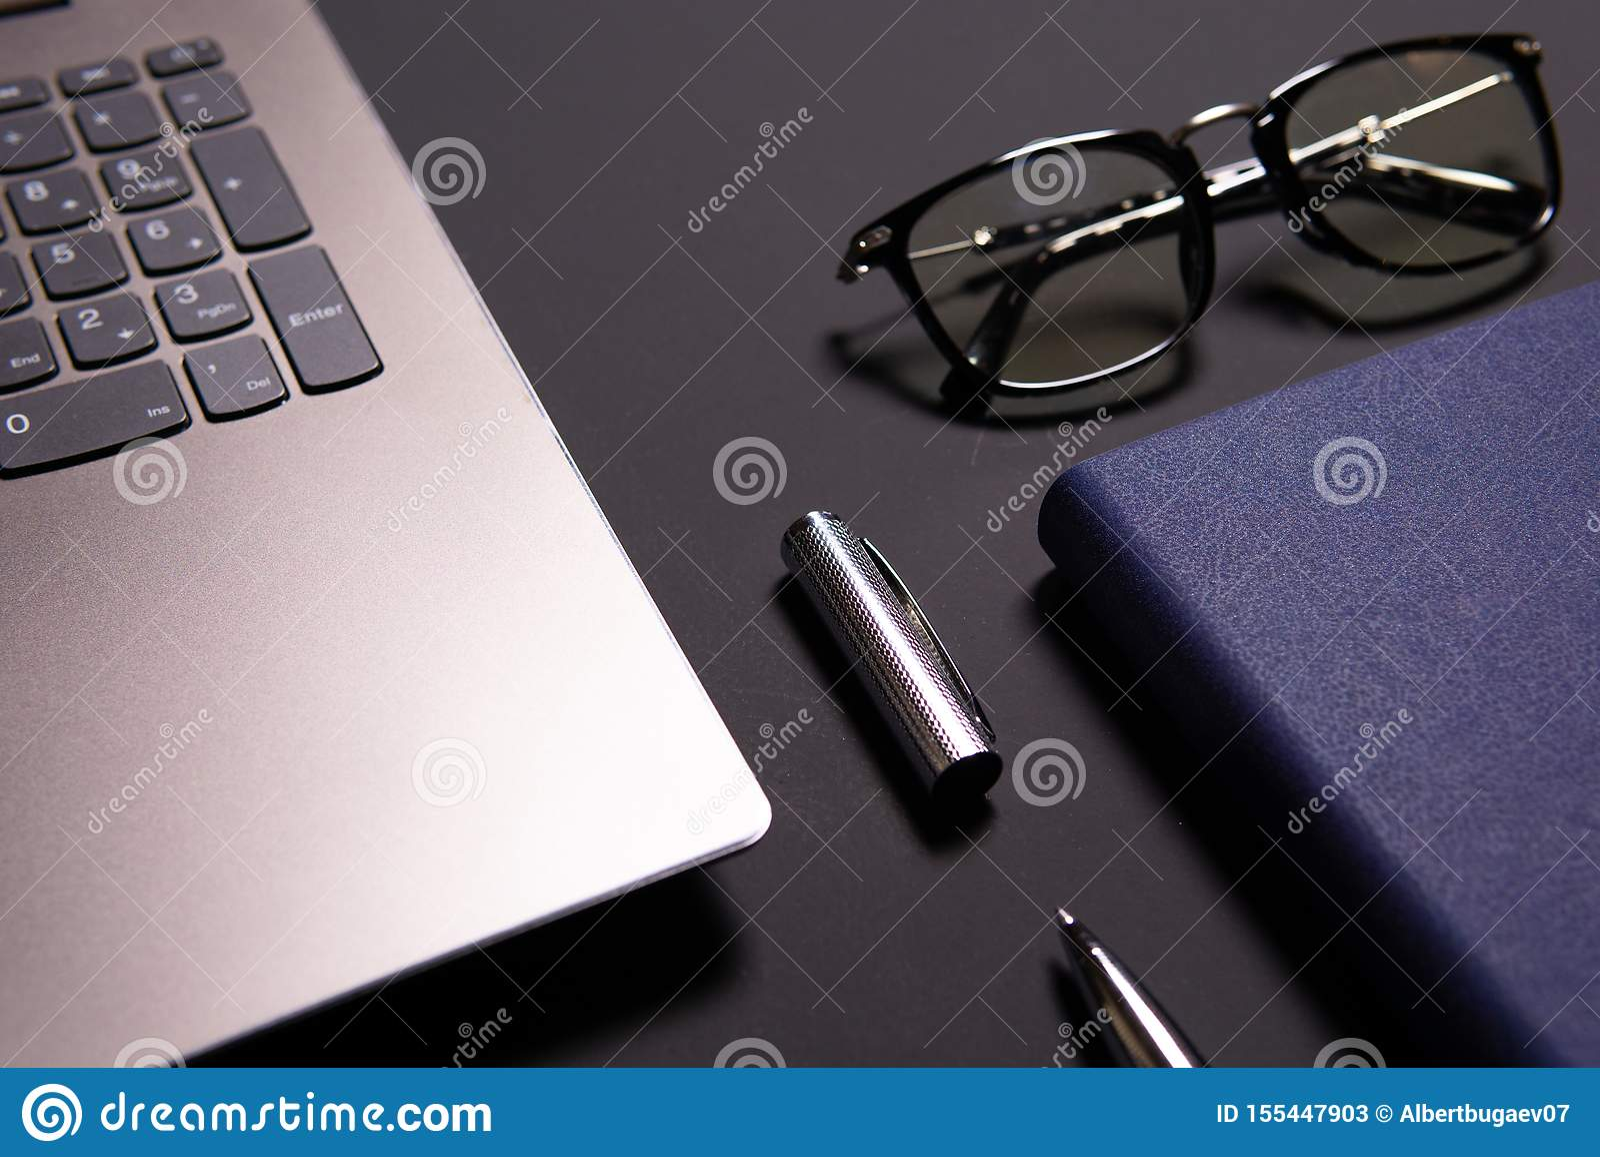 Worksheet Stock Images